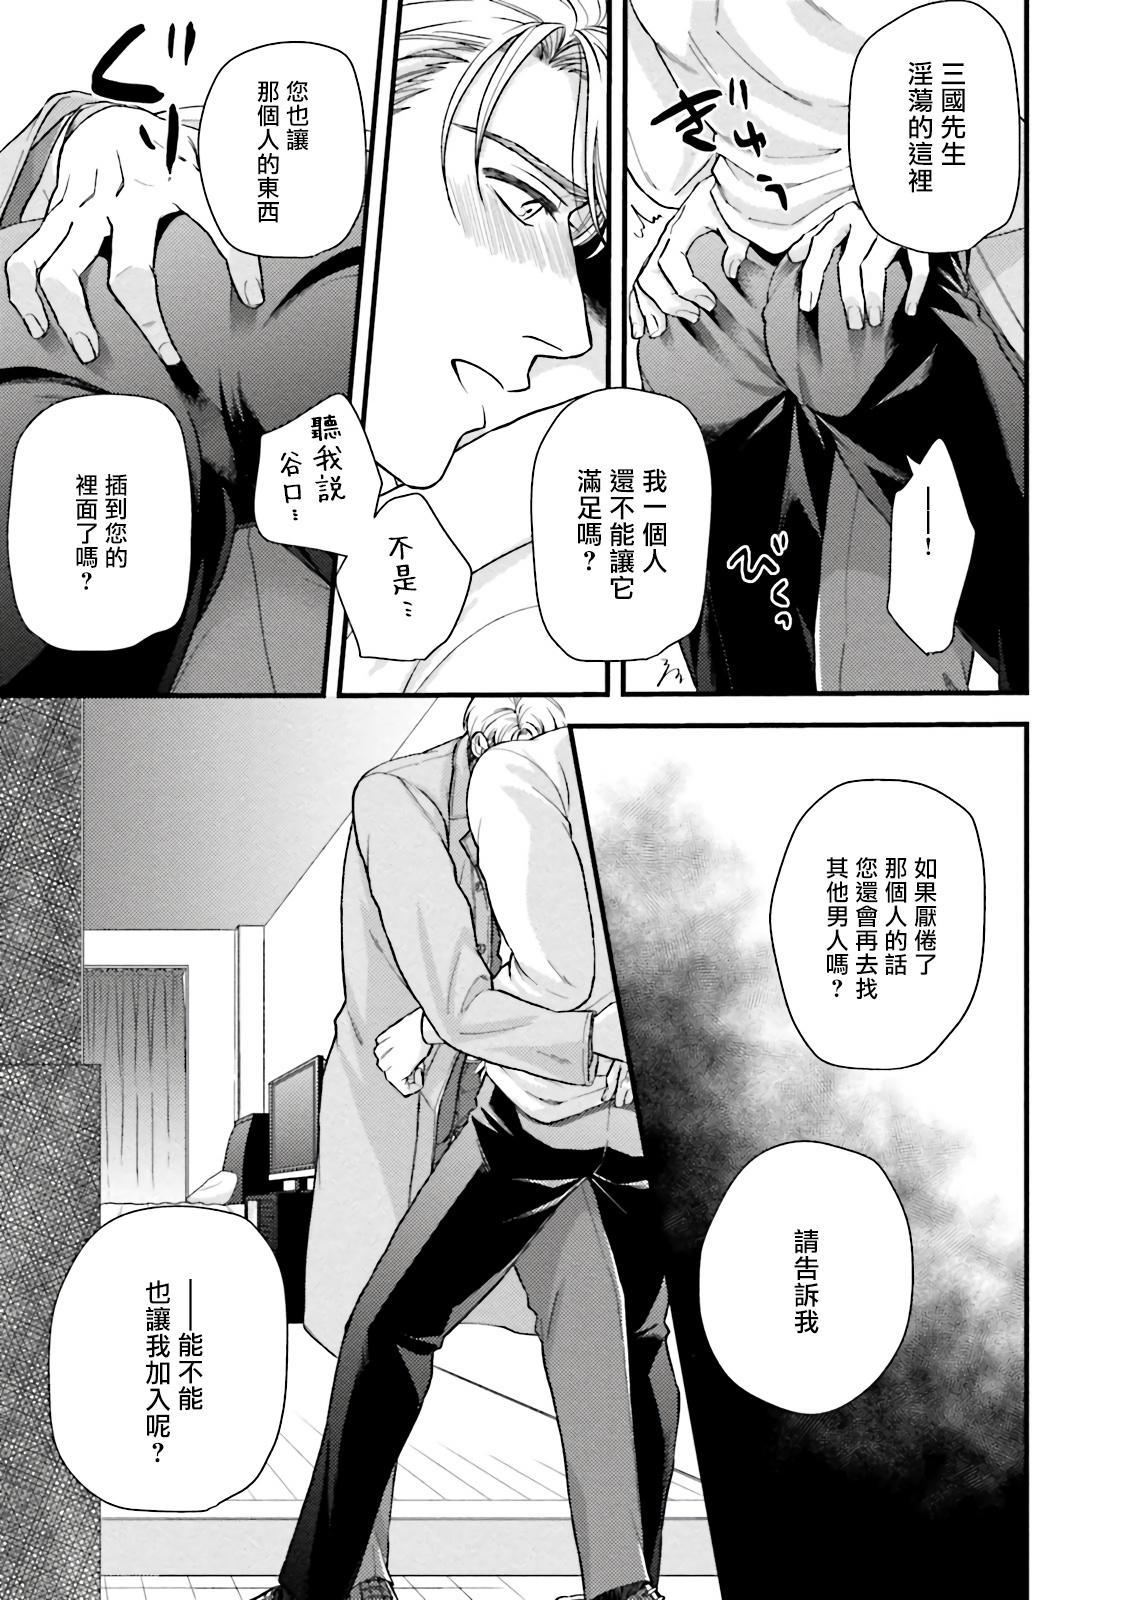 Kinou wa Otanoshimi Deshita ne | 昨天过得很愉快吧 Ch. 1-4+特典 155